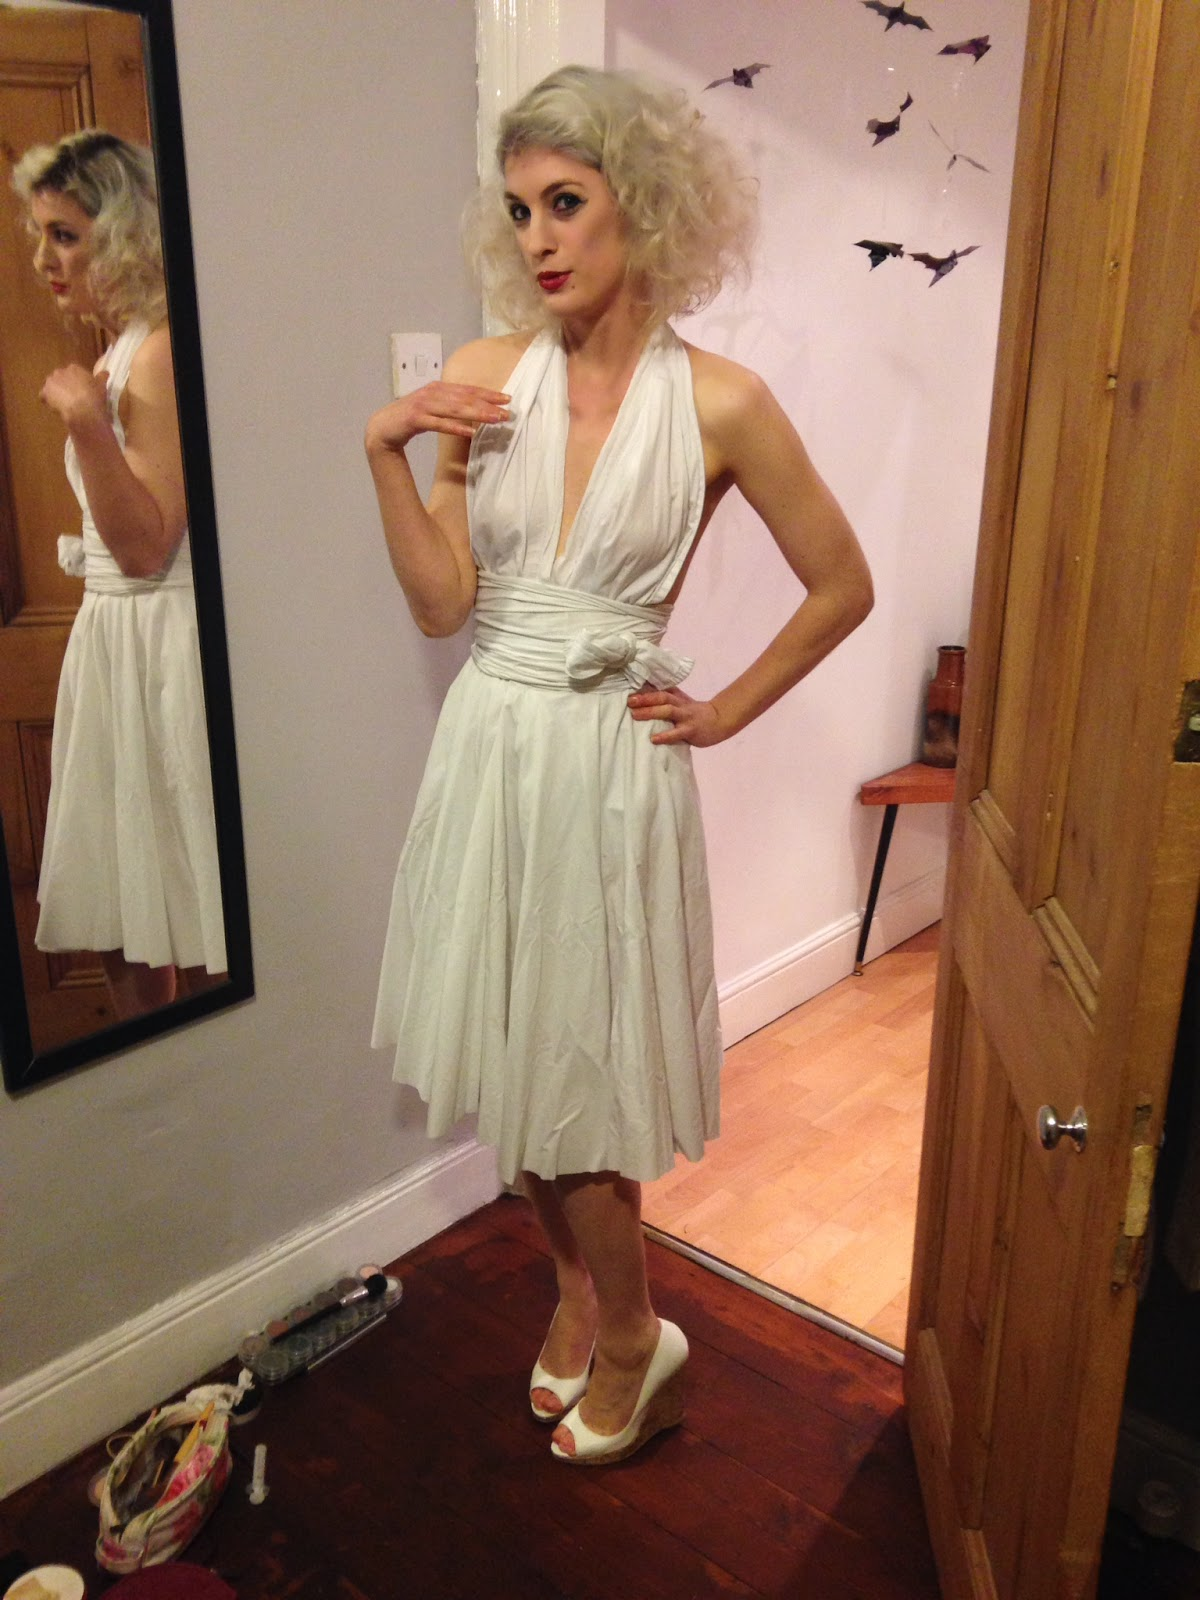 Lily White Legs  DIY No-Sew Marilyn Monroe Costume 420d3f438938